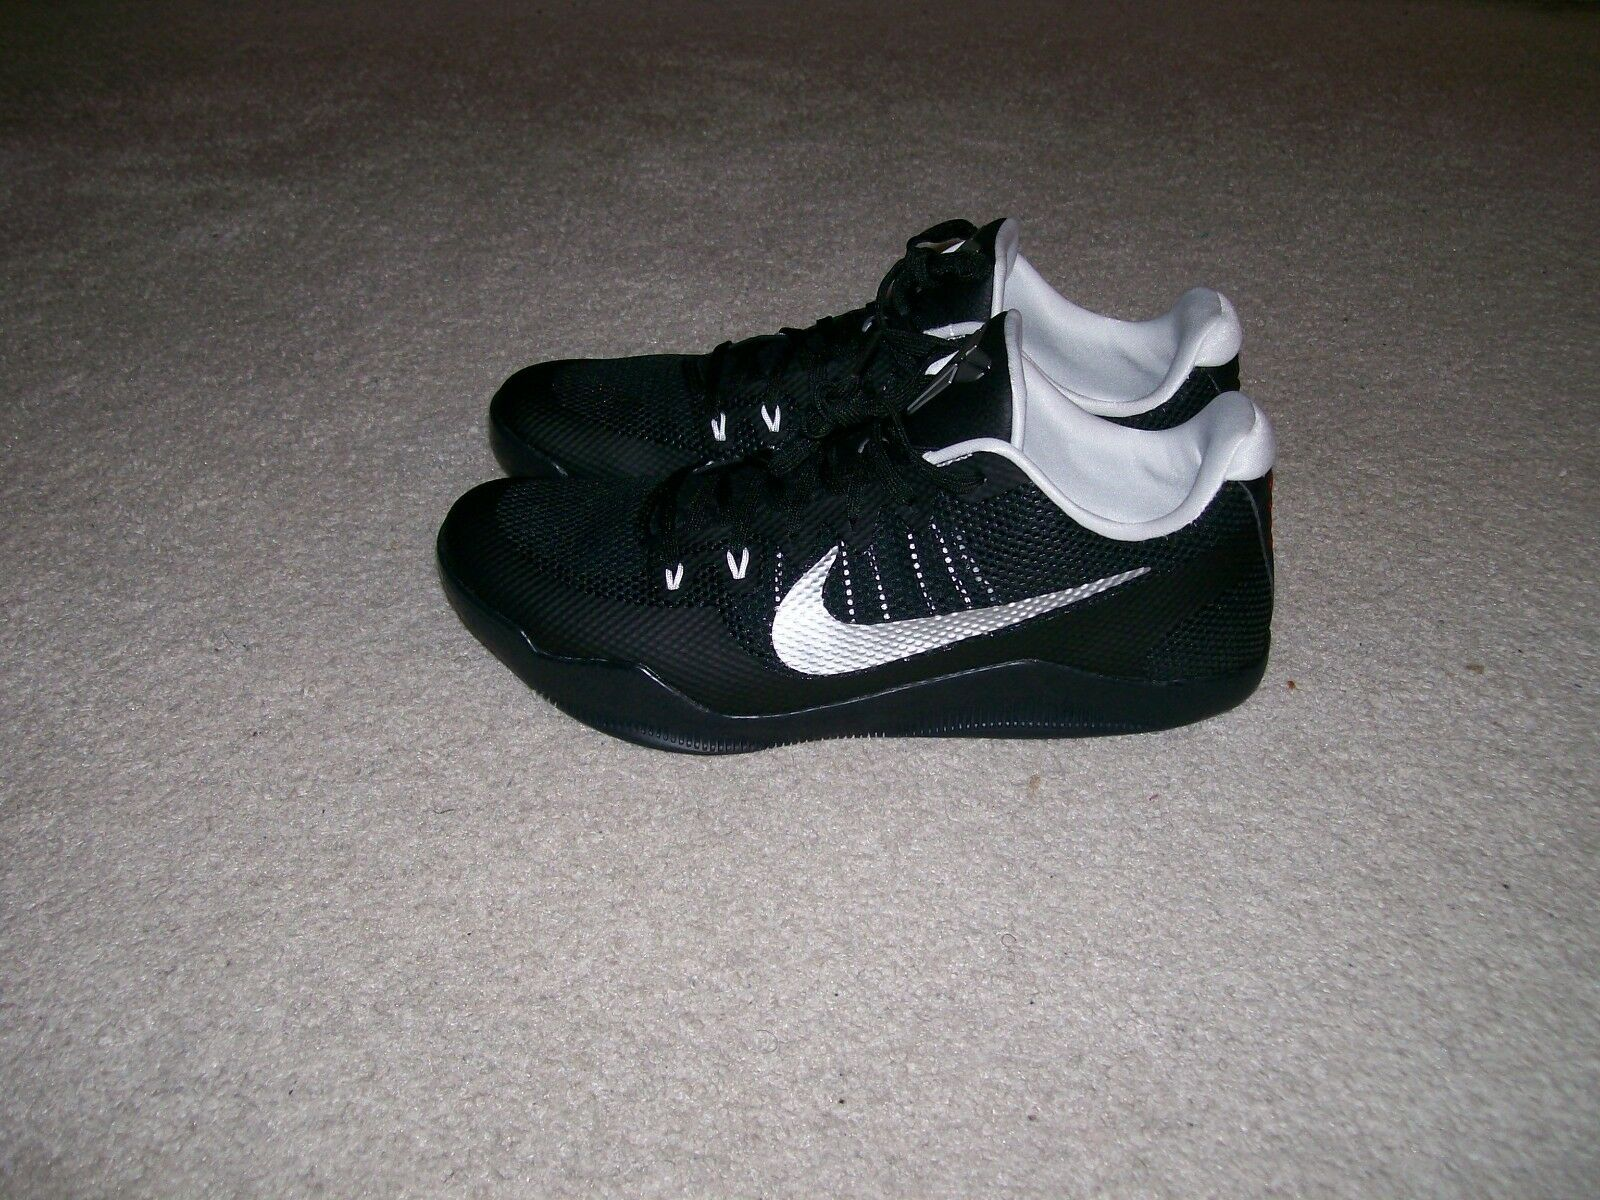 SZ 13 NEW Nike Zoom Kobe XI Protro Black Silver Undefeated 1 IX X IV 856485 001